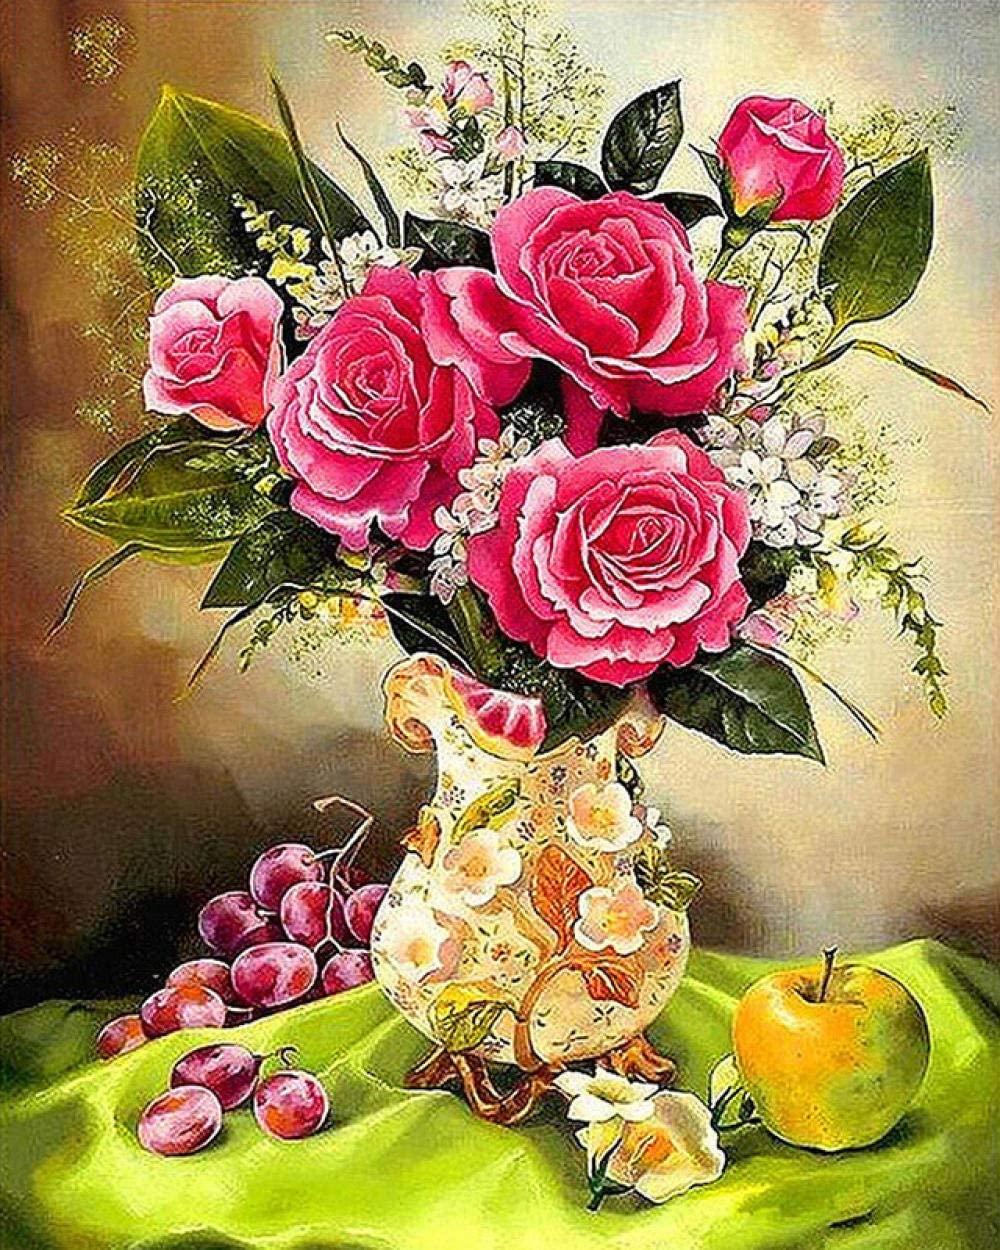 5D DIY Diamond Painting Rose Home Decoration Cross Stitch kit Round Diamond Embroidery Craft Art Gift 70x90cm